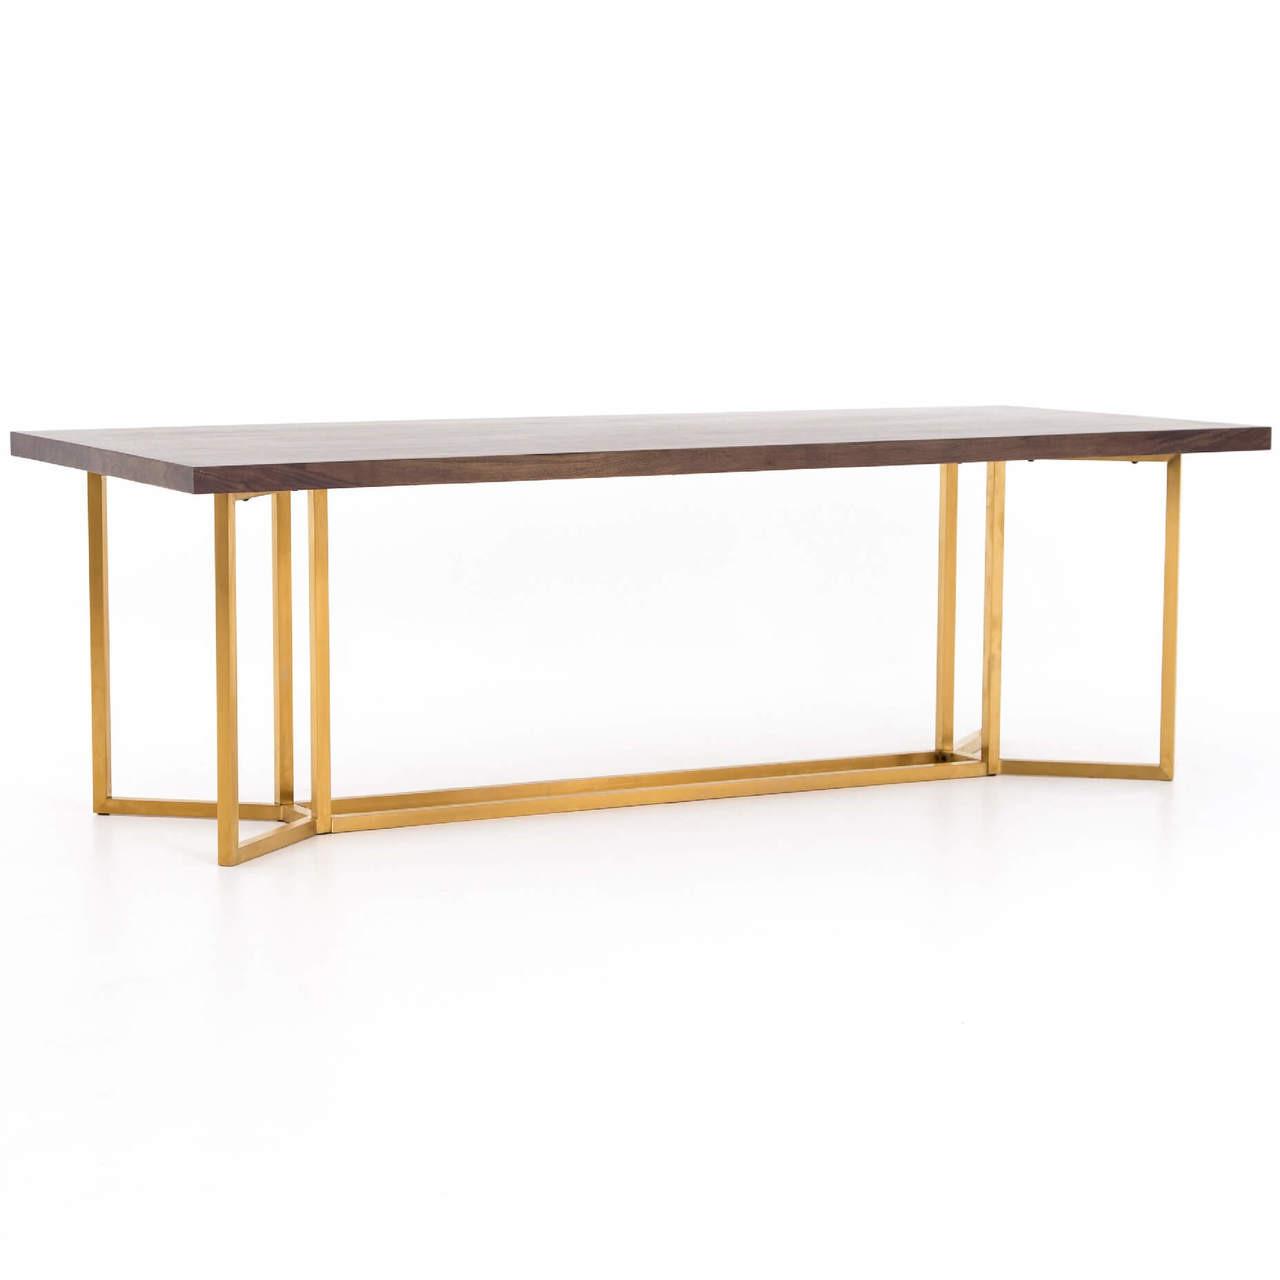 Phenomenal Bryant Polished Brass Leg Walnut Wood Dining Table 95 Interior Design Ideas Tzicisoteloinfo